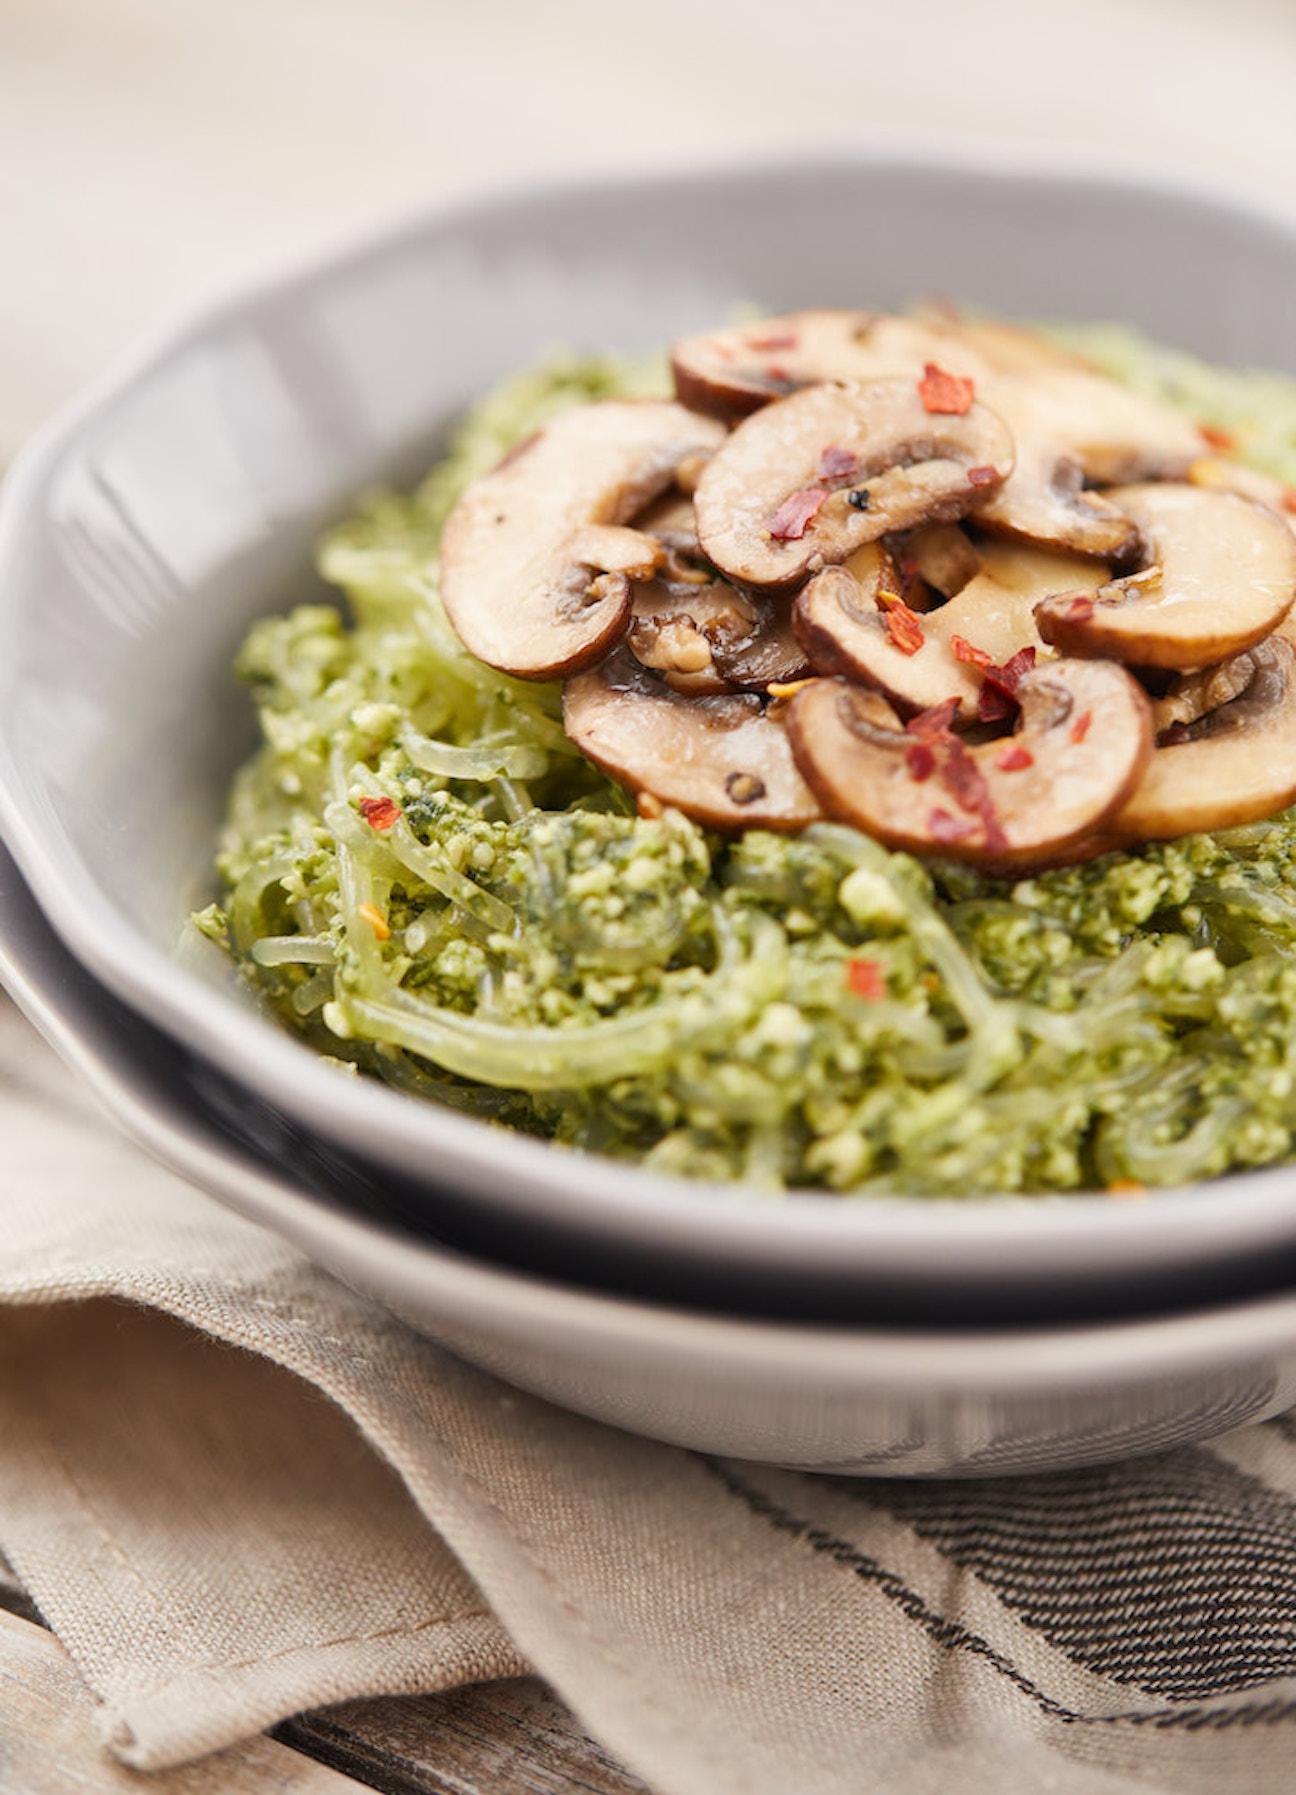 Vegan Kelp Noodles with Pesto